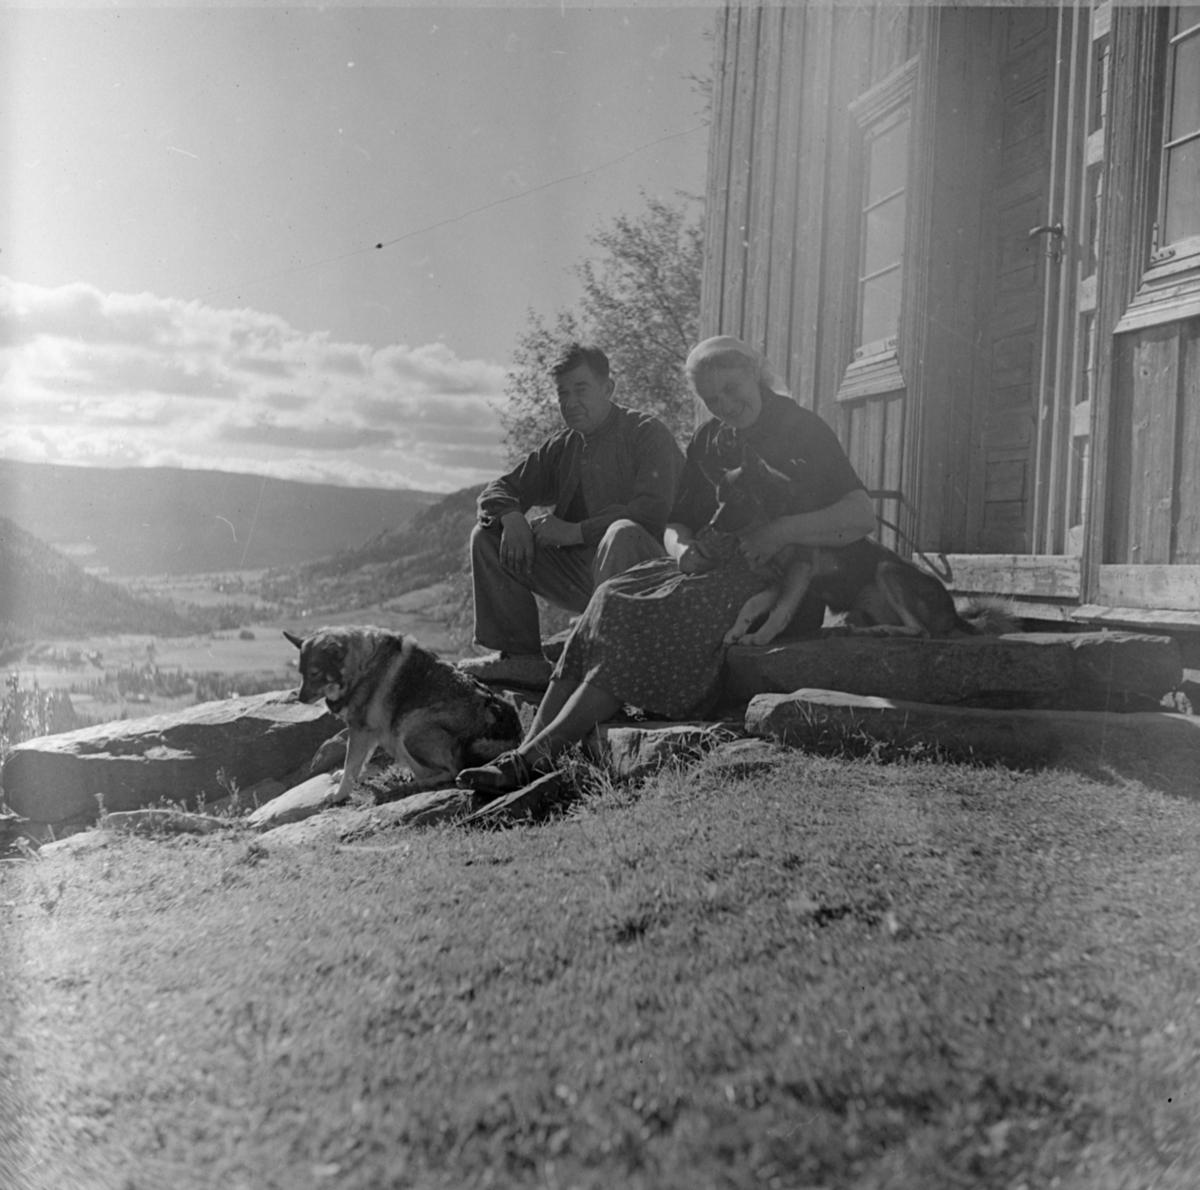 Ågot og Olav Einstad, antakelig på Nordre Einstad